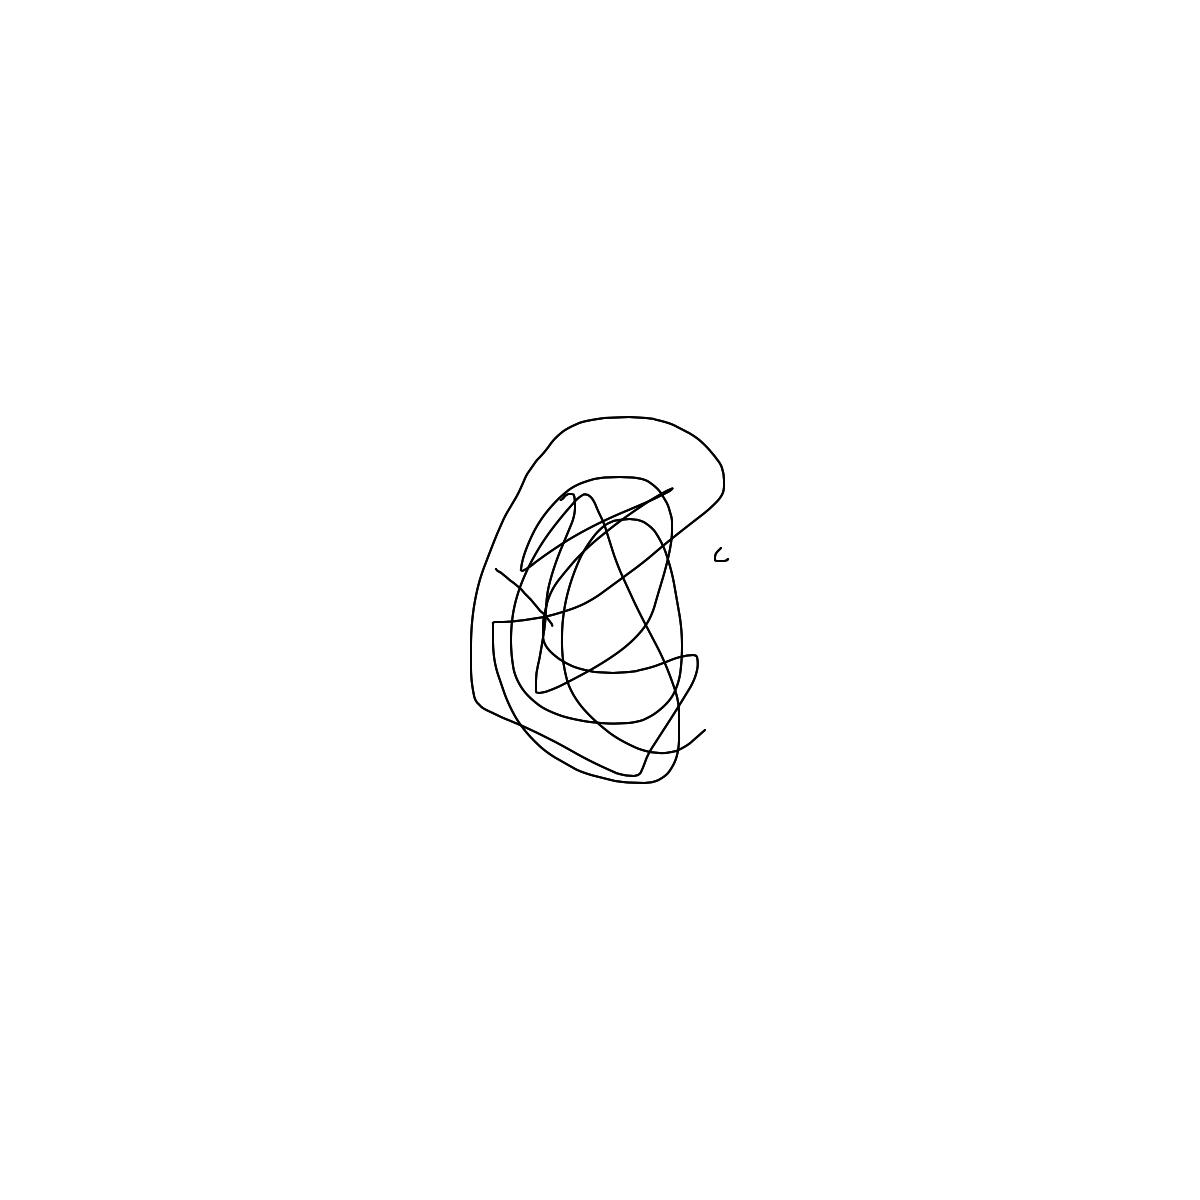 BAAAM drawing#7461 lat:31.6744213104248050lng: 34.5780944824218750